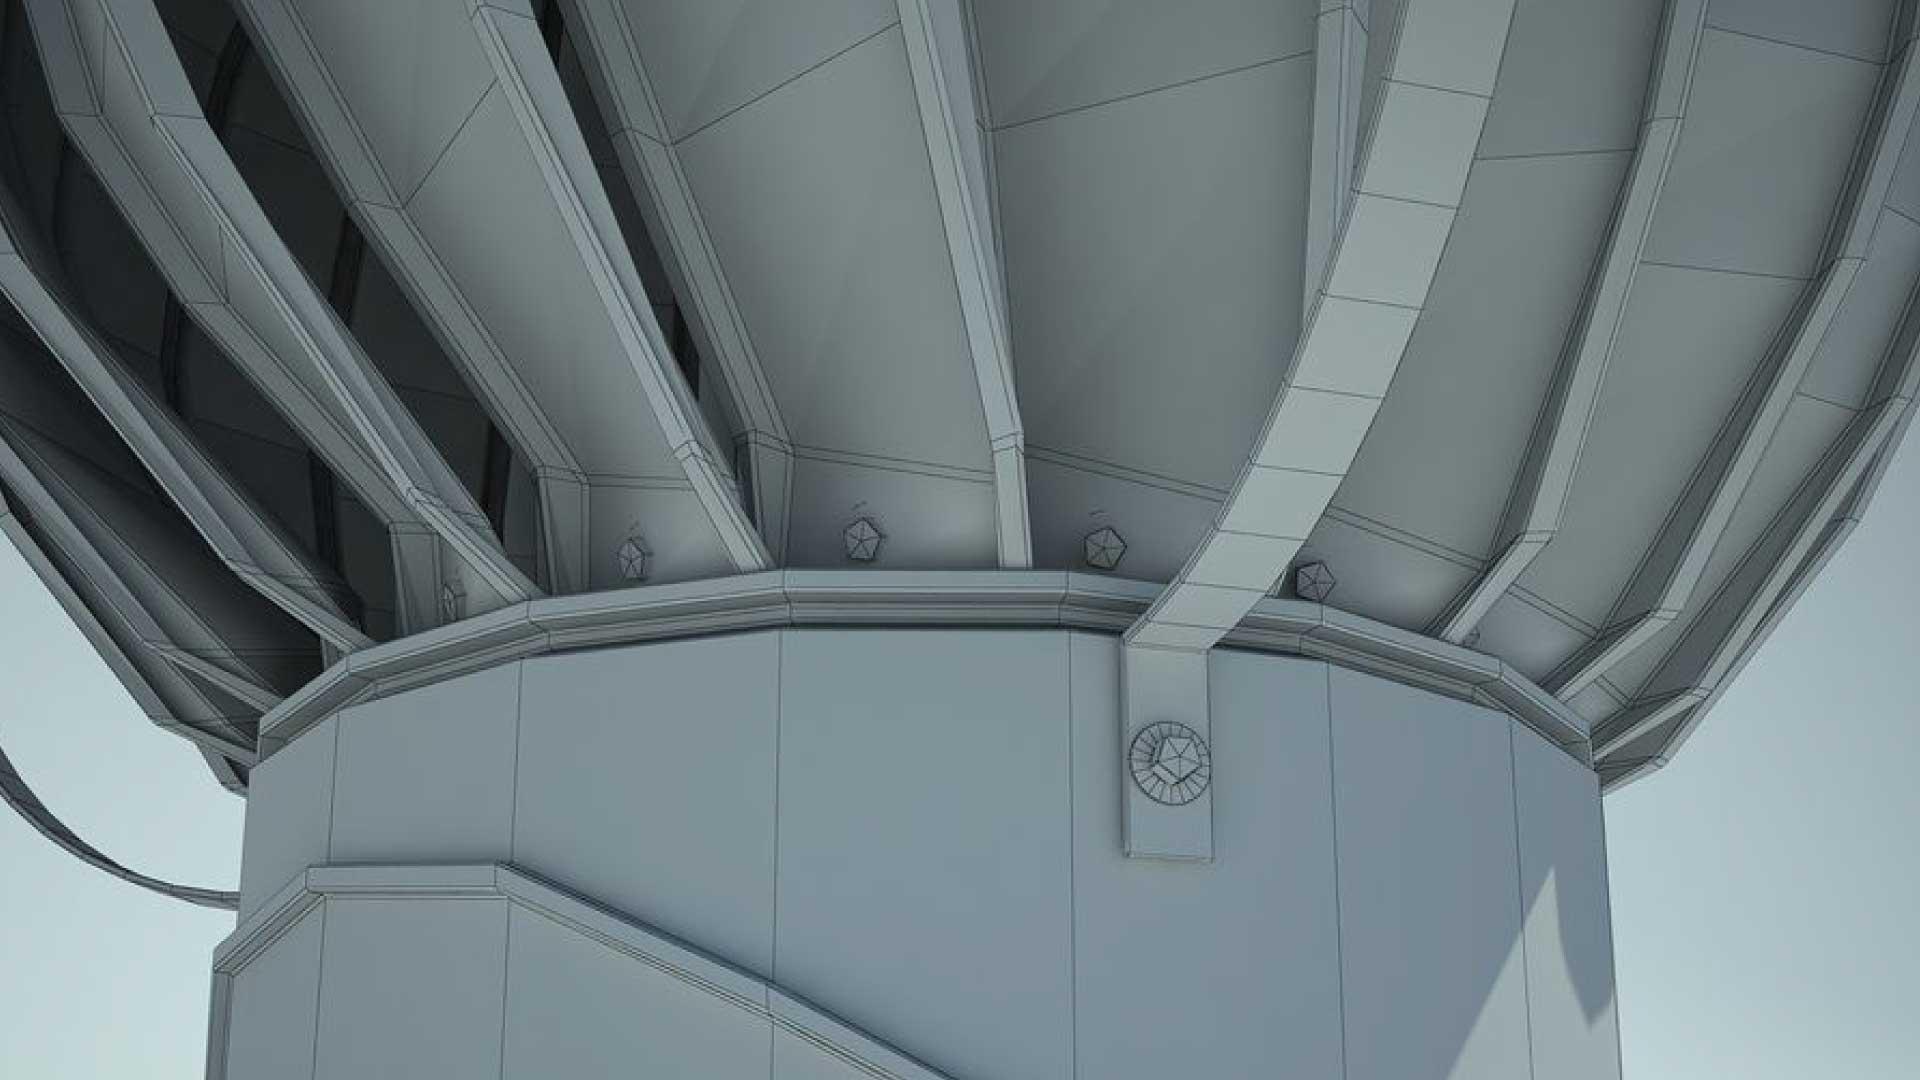 roof ventilation whirlybirds